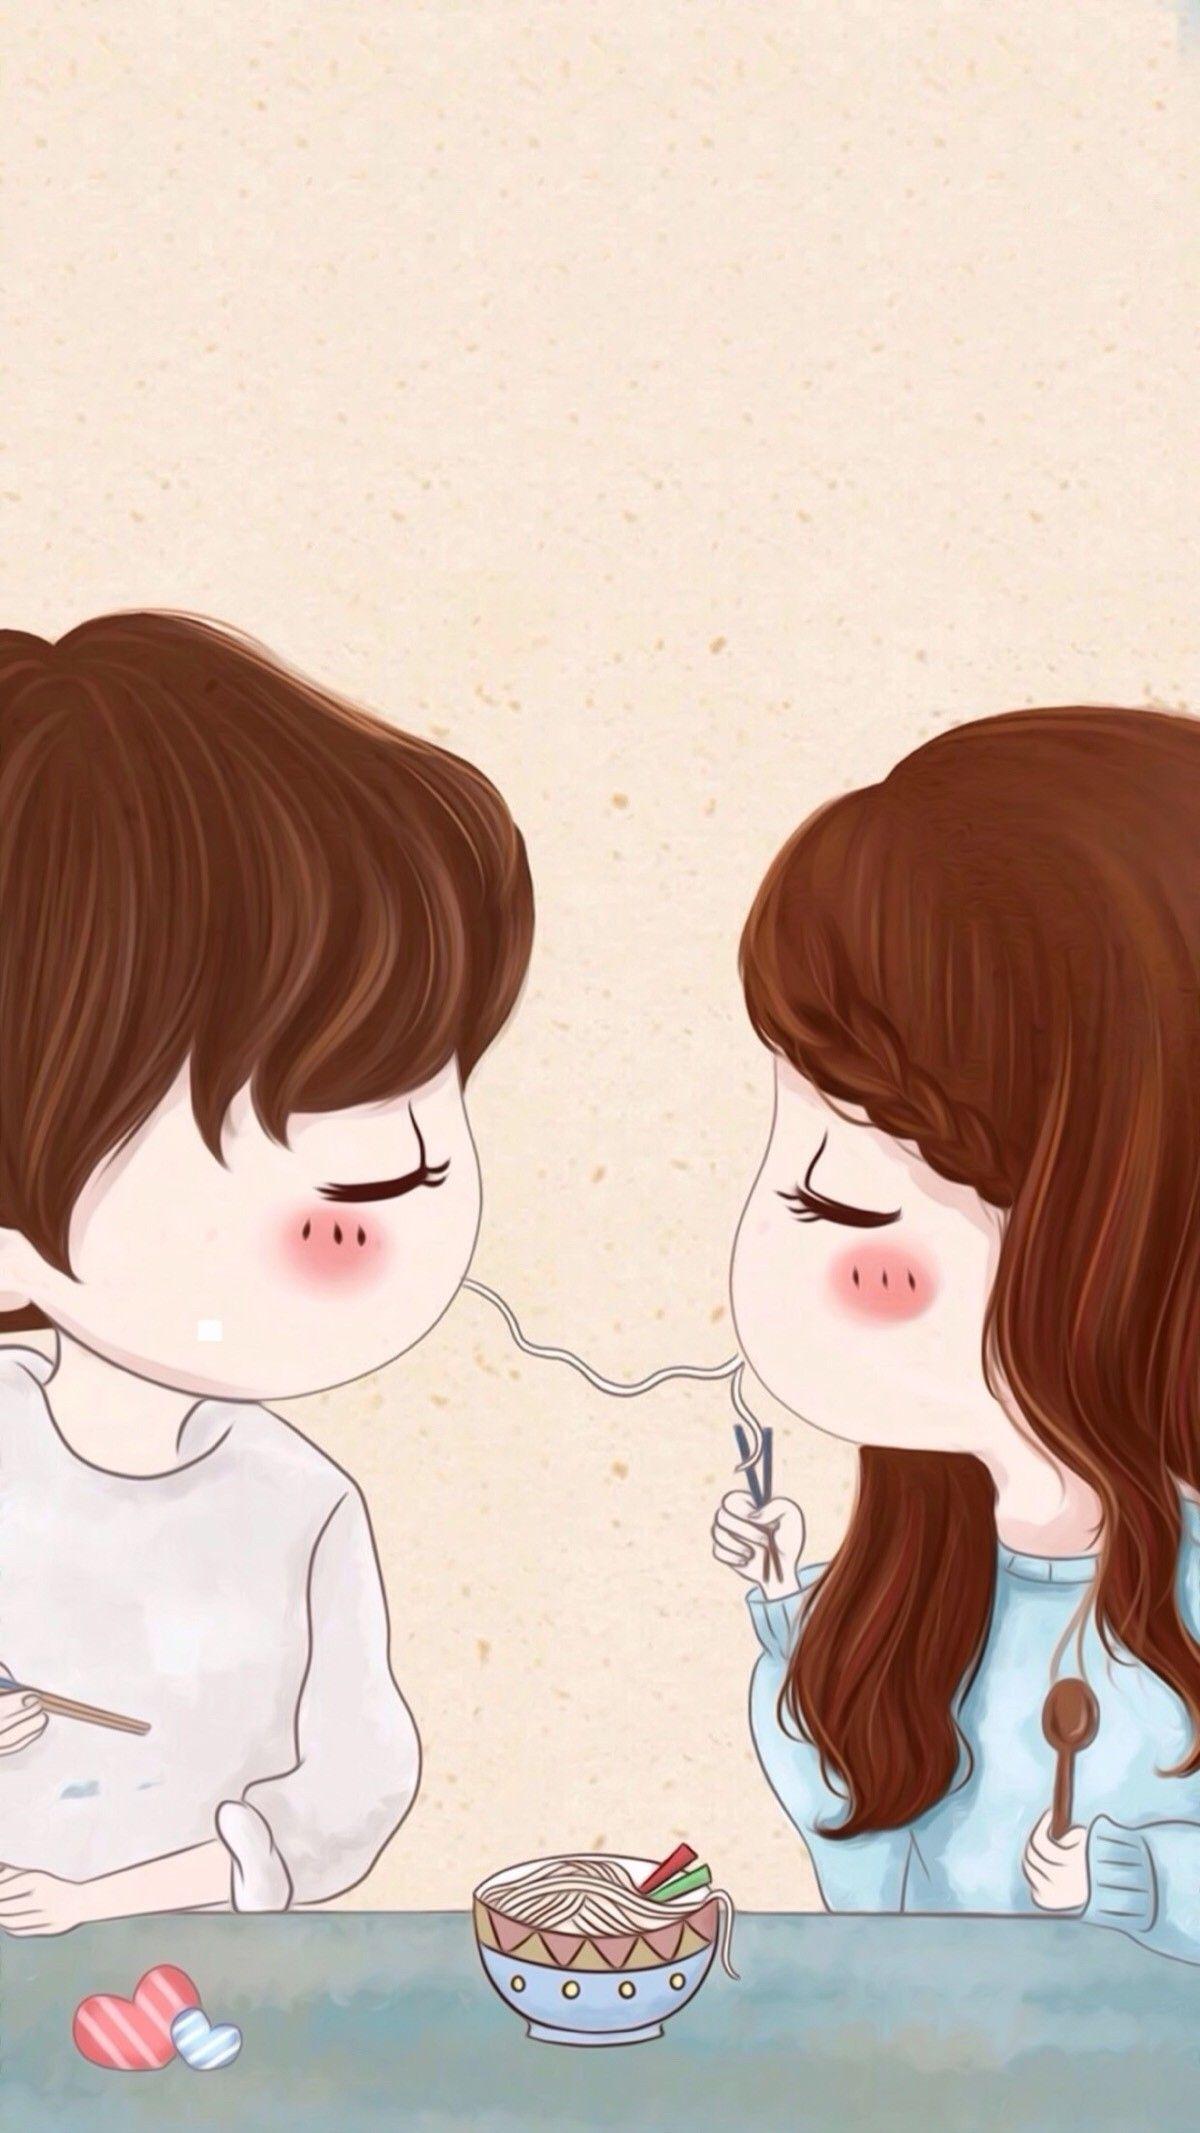 Pin By Rose On Love Cute Couple Cartoon Cute Couple Wallpaper Cute Chibi Couple